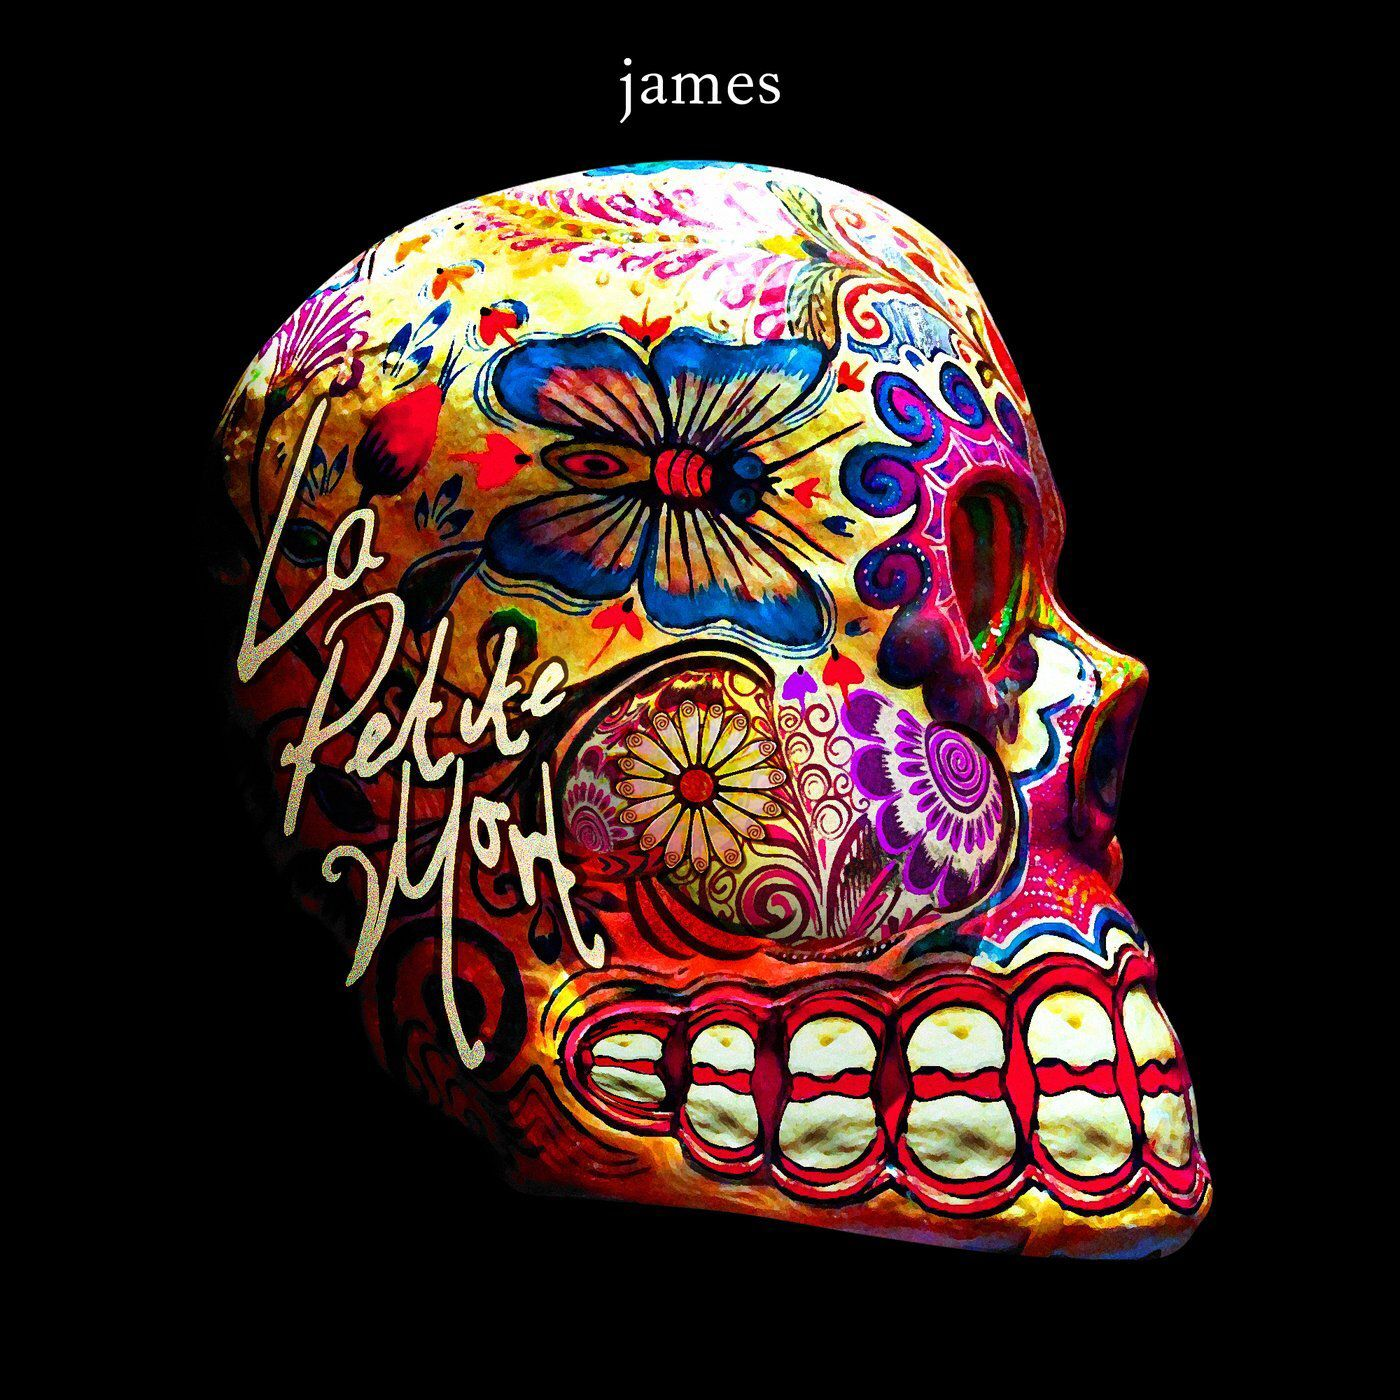 Image From Http Upload Wikimedia Org Wikipedia En C C0 La Petite Mort Album Cover Jpg With Images La Petite Mort Album Covers Album Art